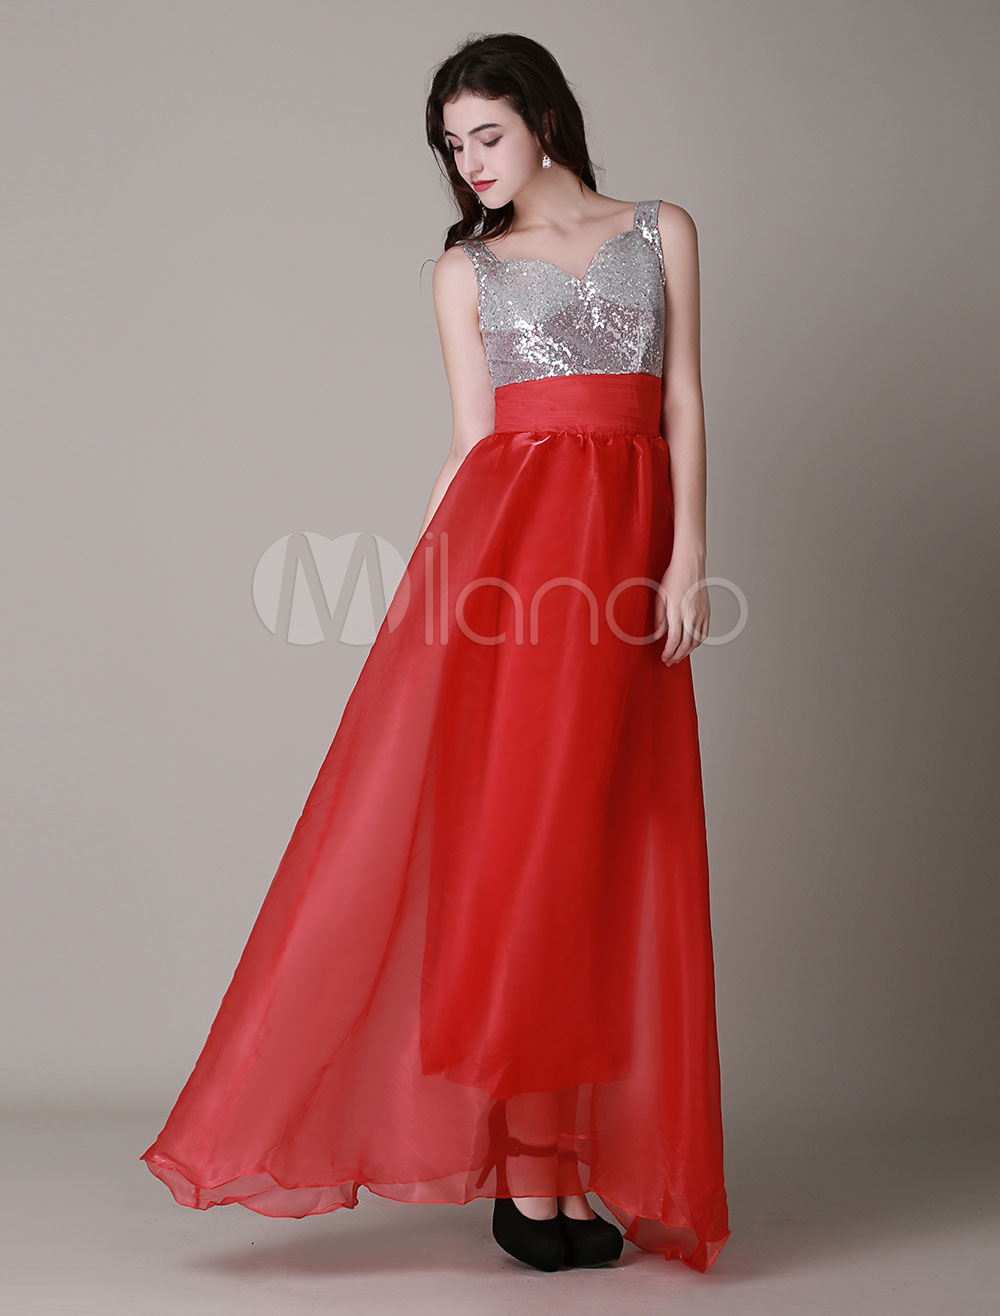 Red Maxi Dress Straps Deep-V Sequins Dress